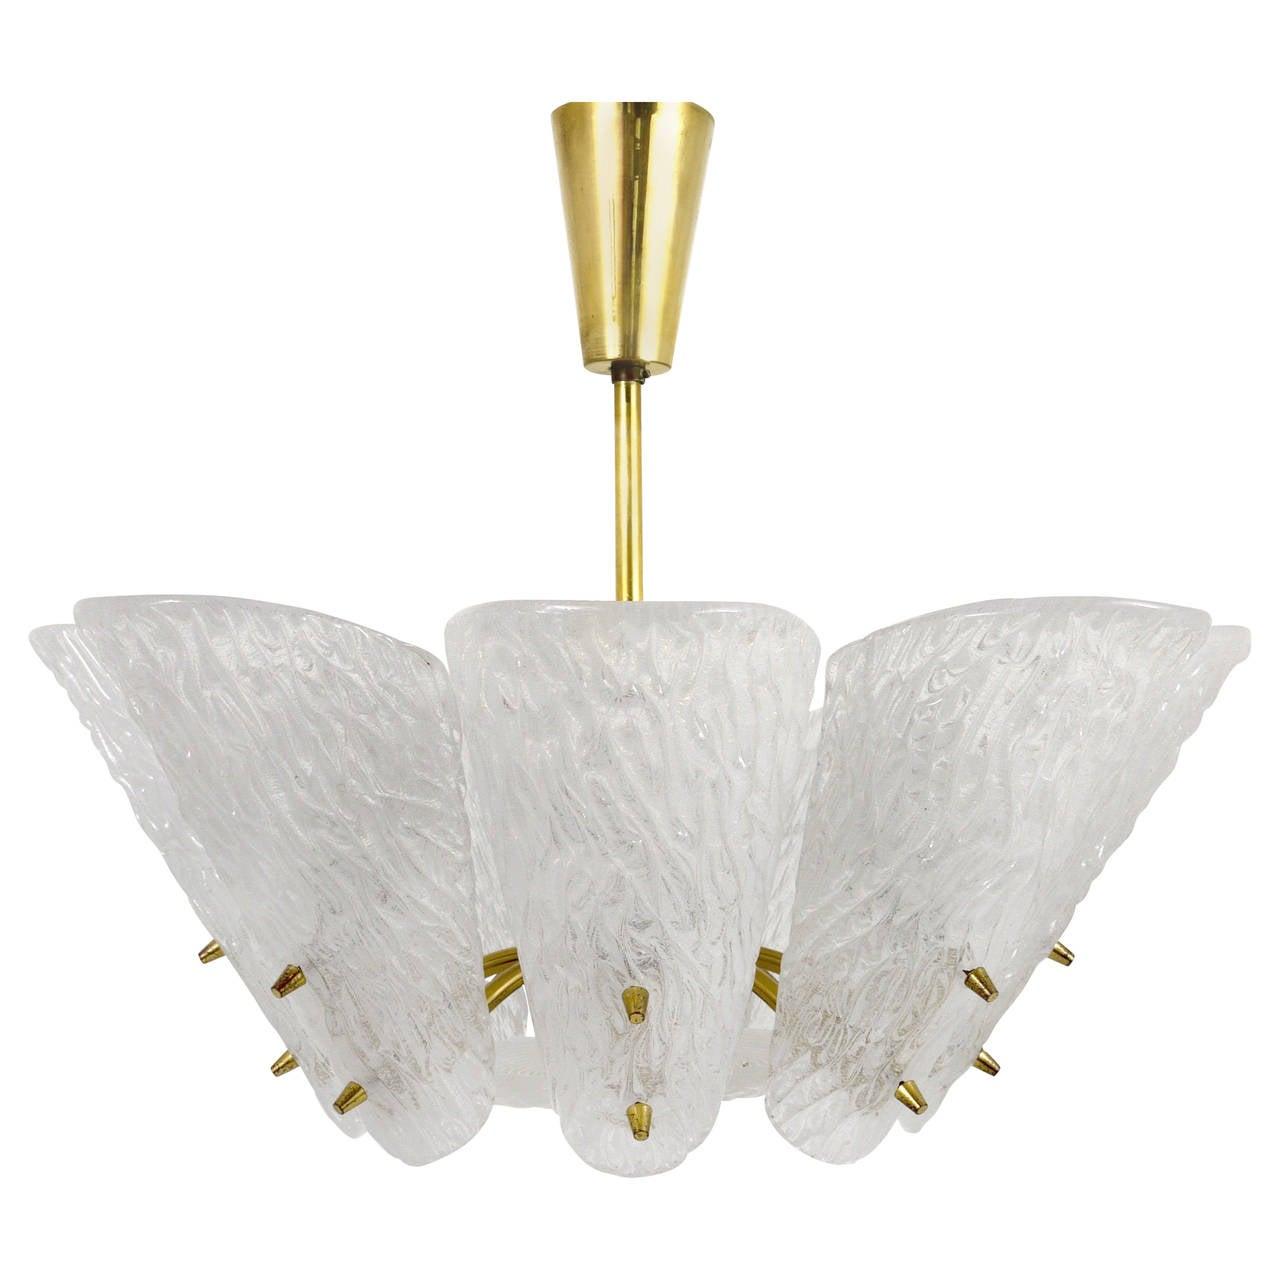 Kalmar Mid Century Brass Chandelier with White Textured Glass Lamp Shades, 1950s